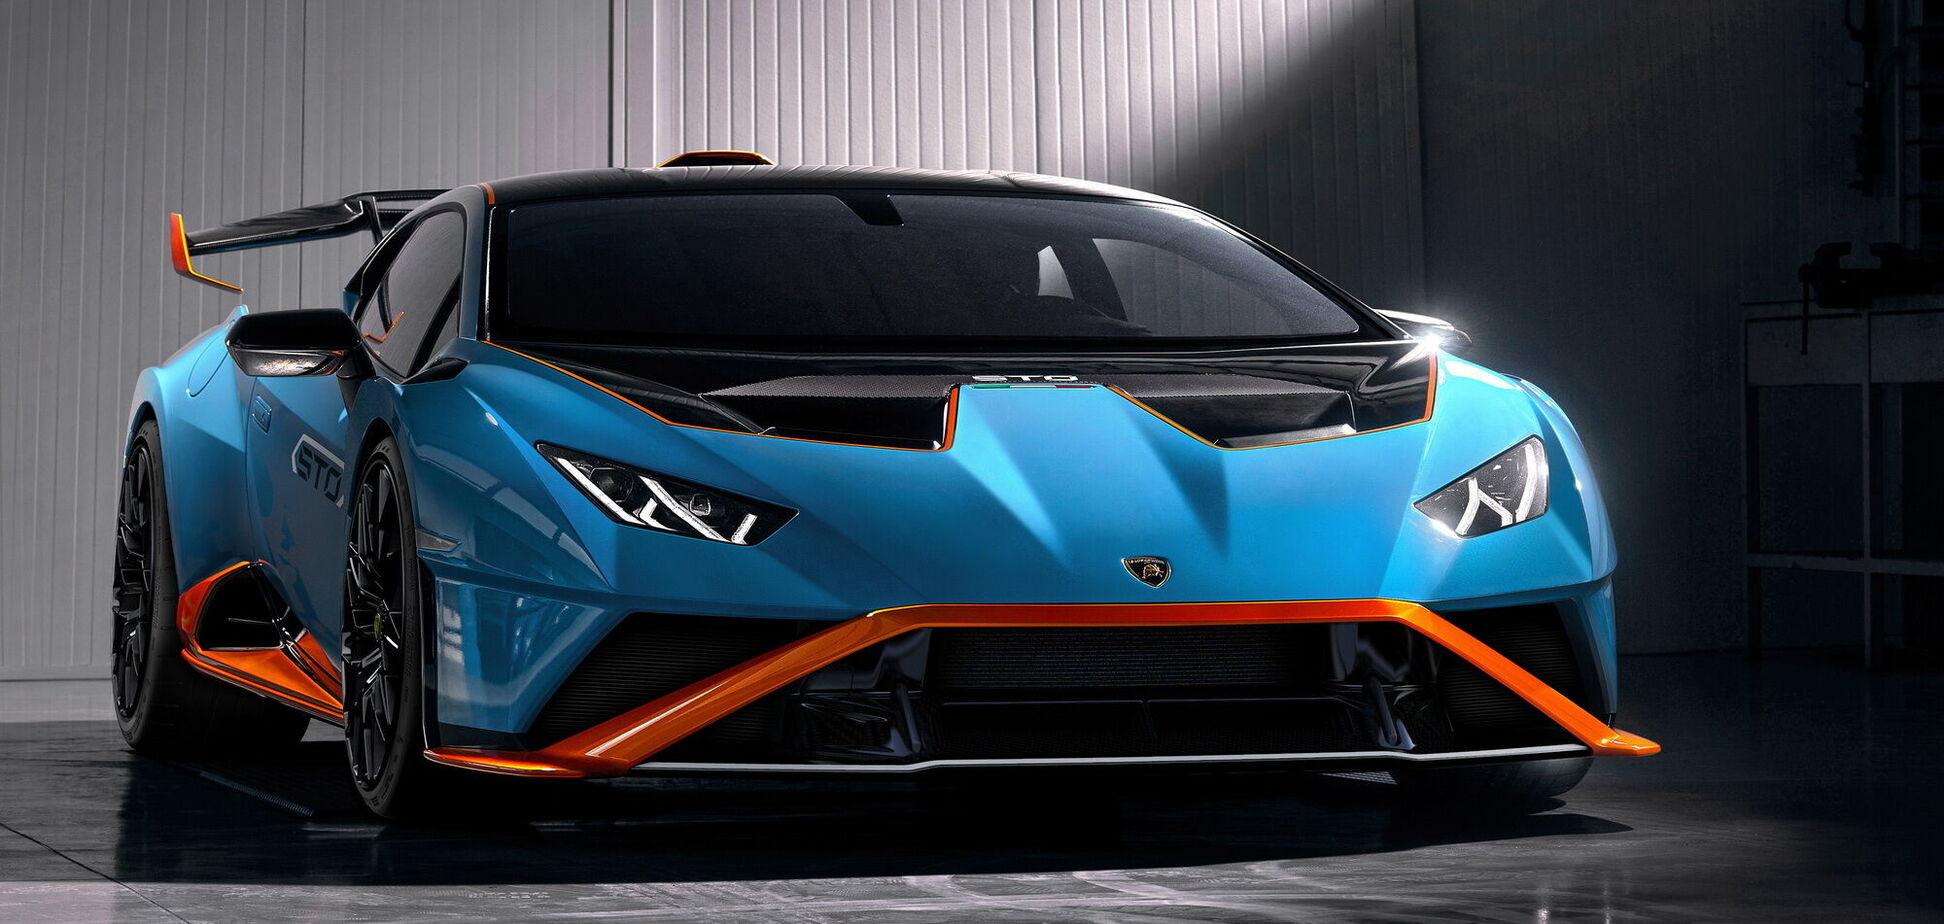 Lamborghini тестує на Нюрбургринзі новий Huracan STO